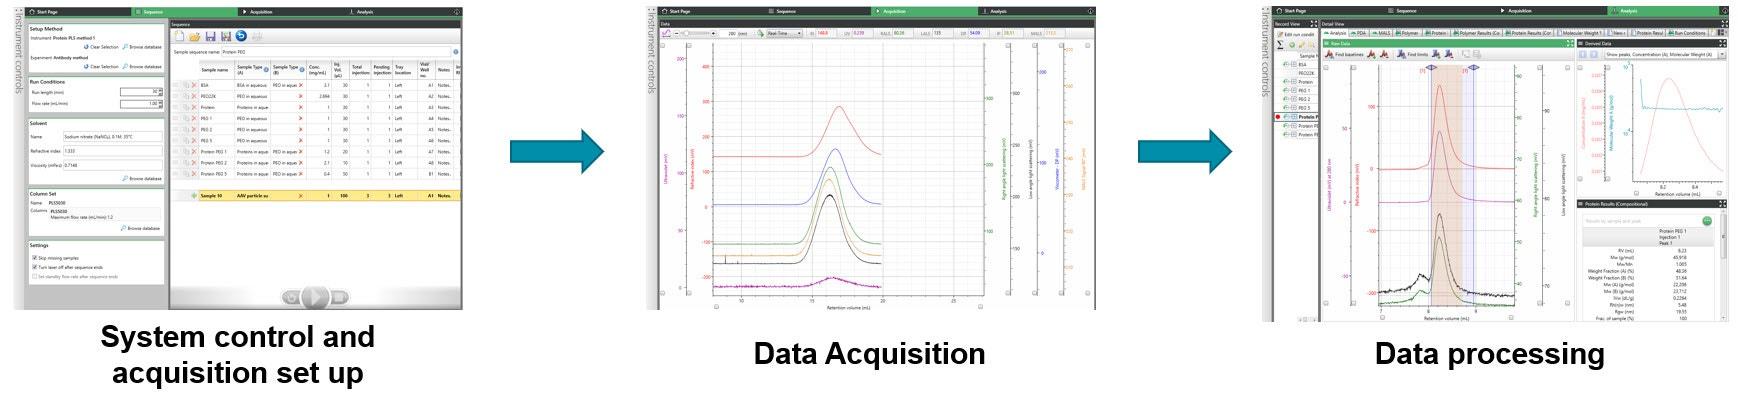 Omnisec software data action diagram.jpg